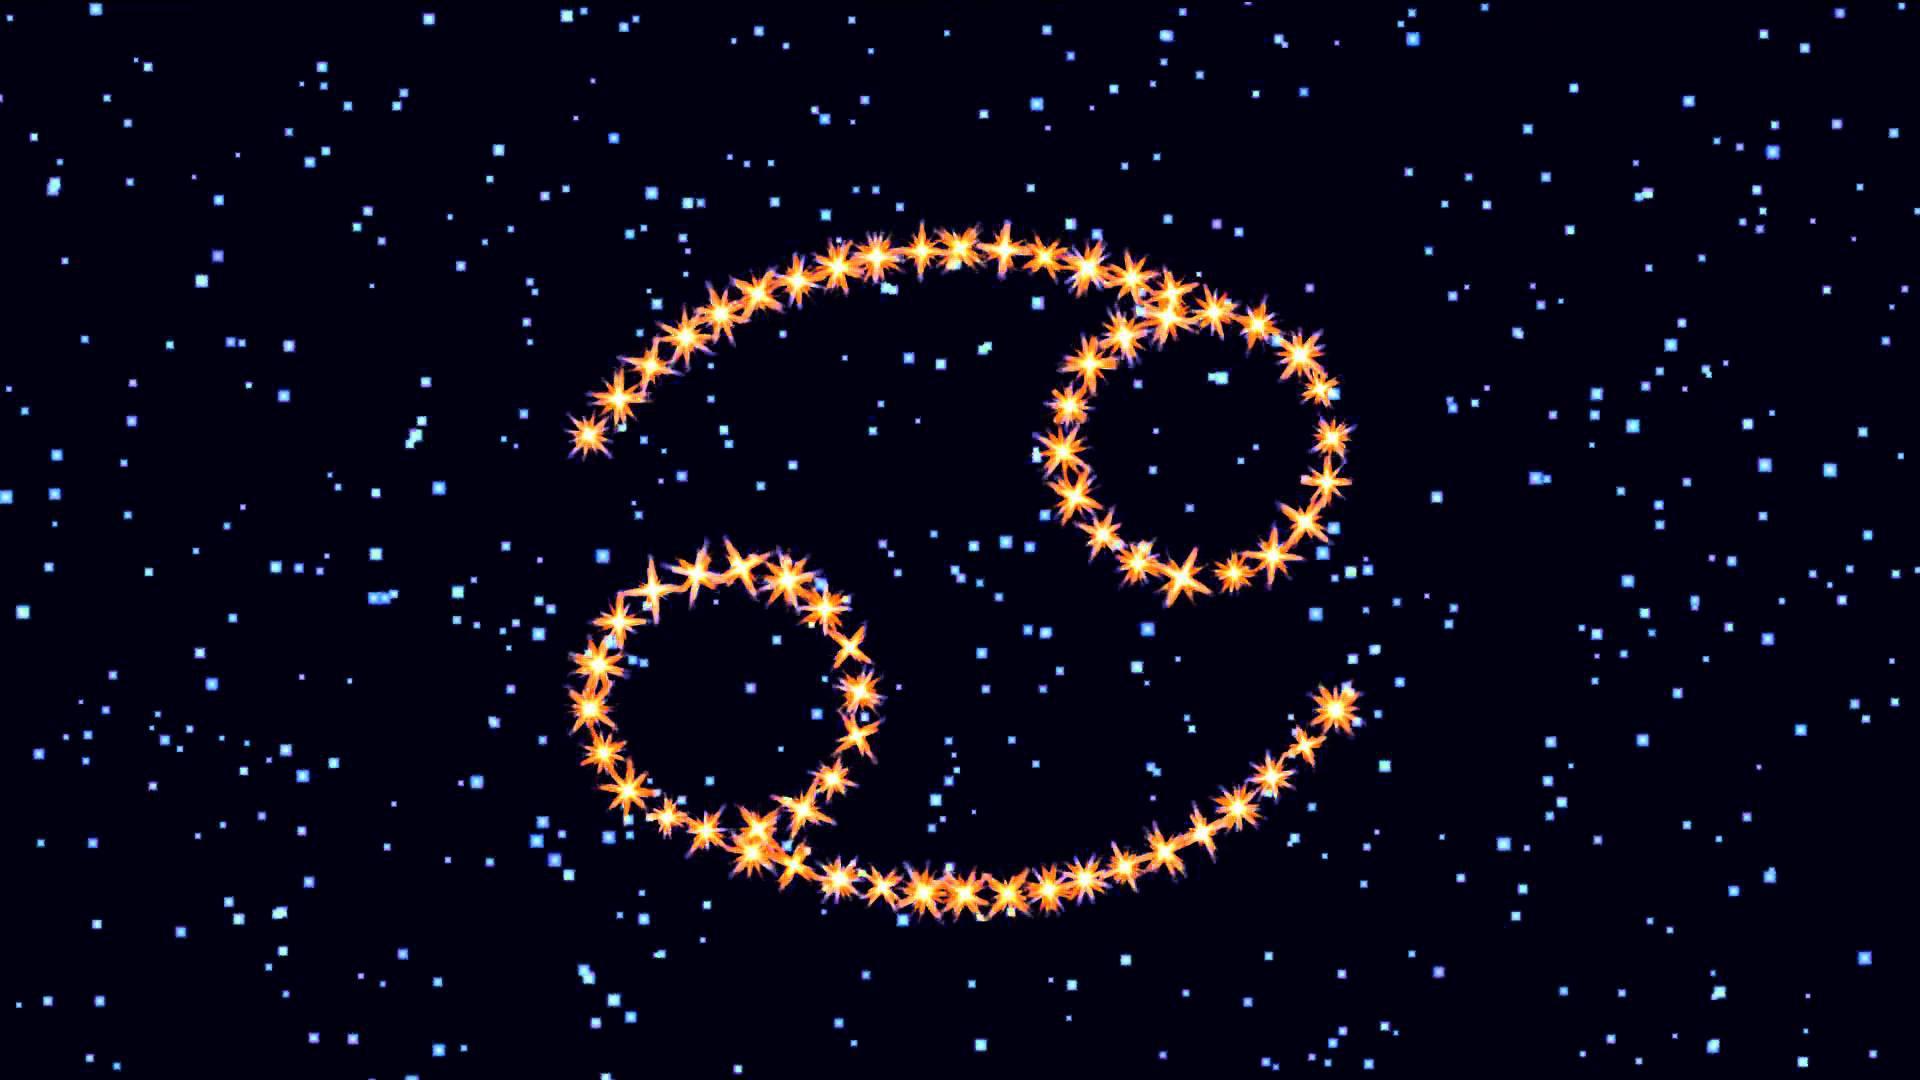 2017Zodiac signs Star sign Cancer 111991 23